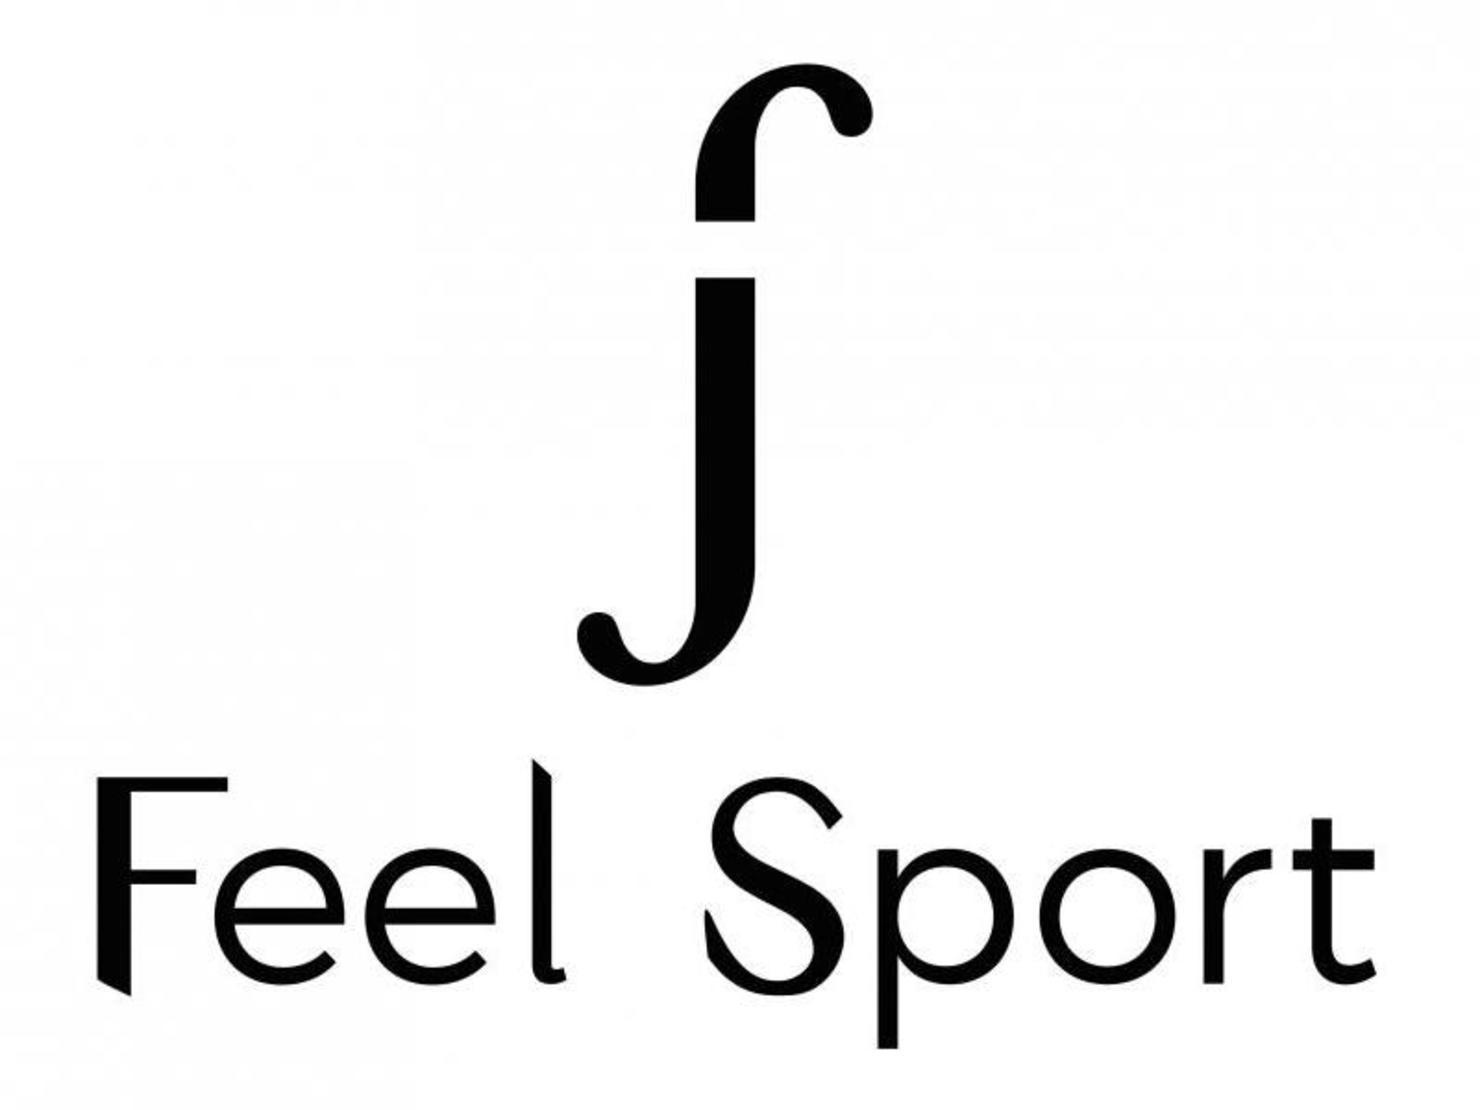 feel sport le havre tarifs avis horaires essai gratuit. Black Bedroom Furniture Sets. Home Design Ideas